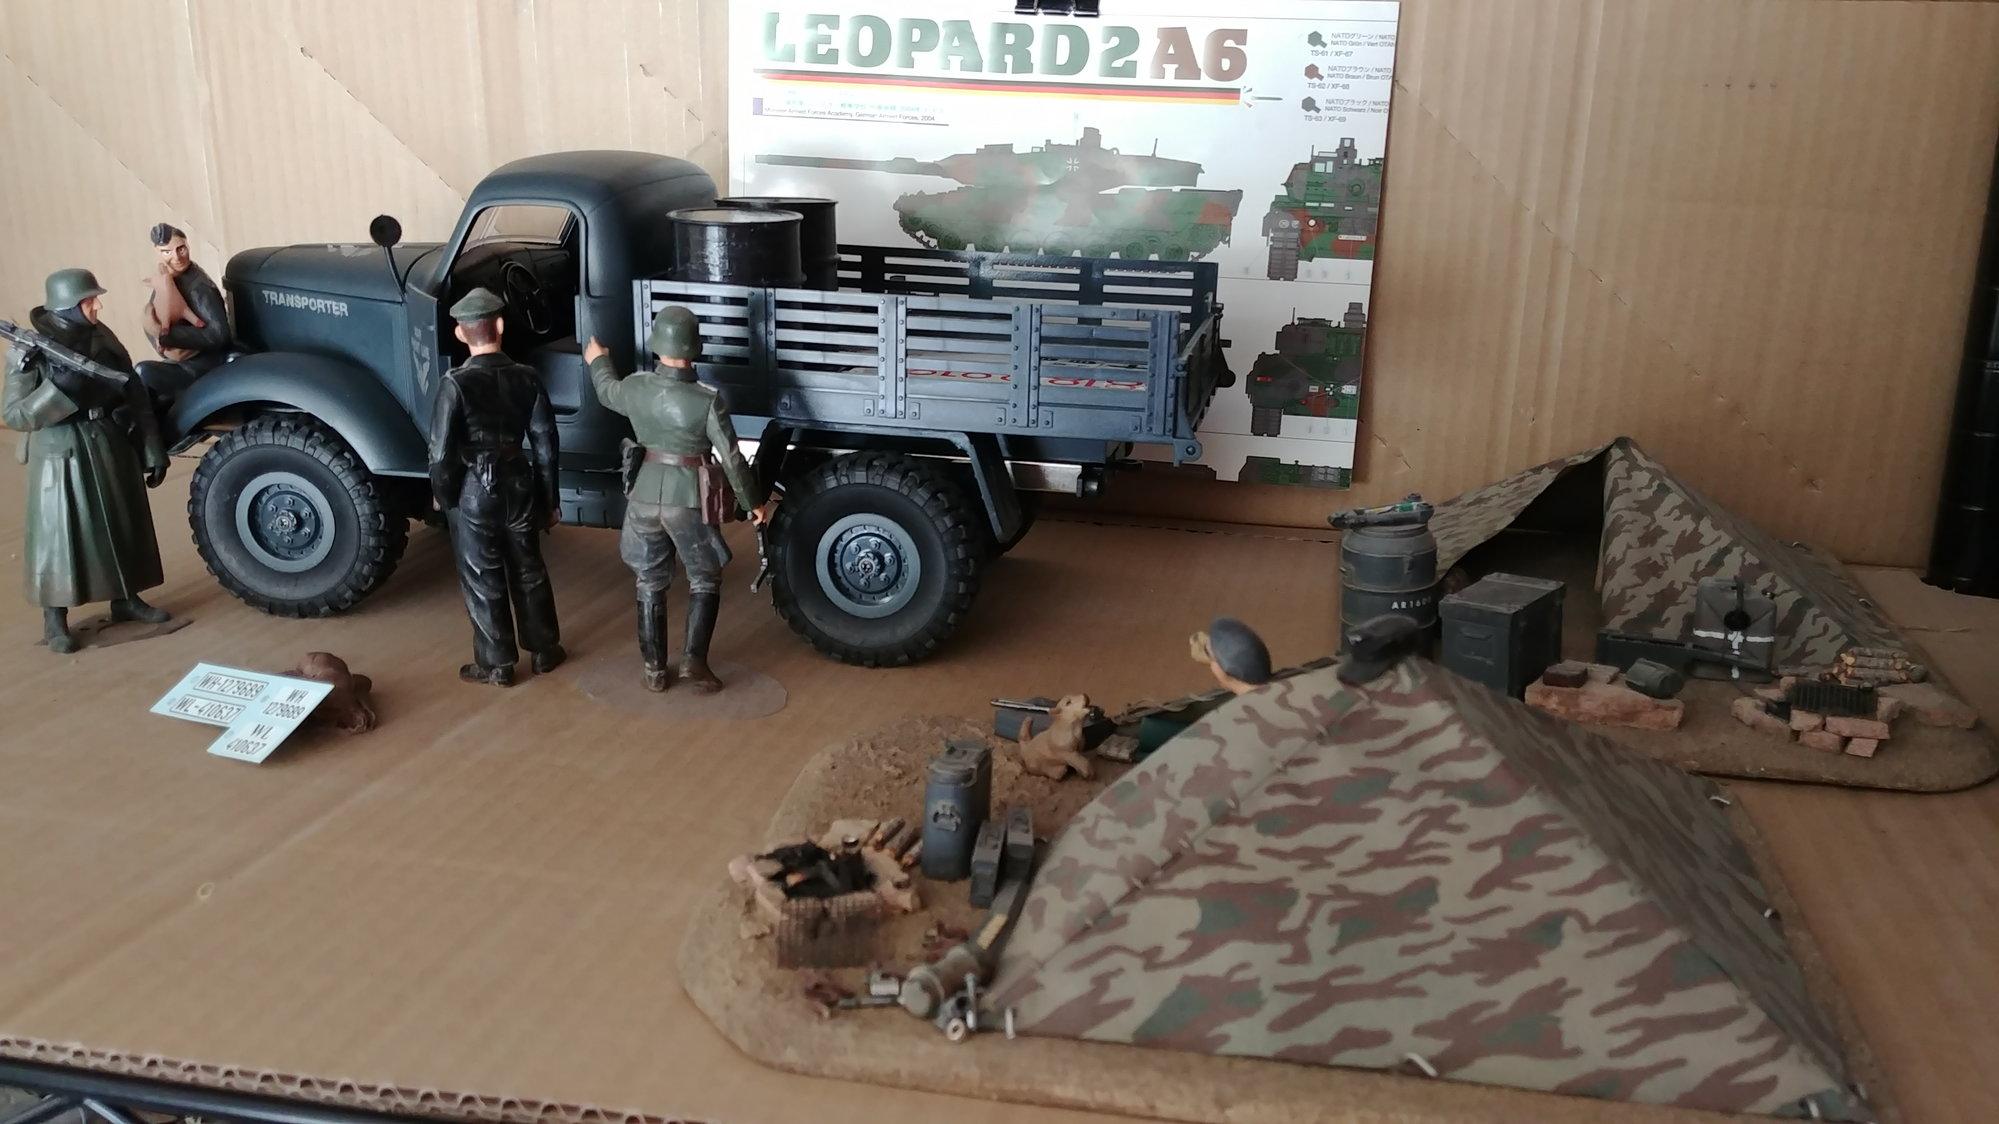 Jjrc q60 6x6 1/ 16 scale rc military truck - RCU Forums